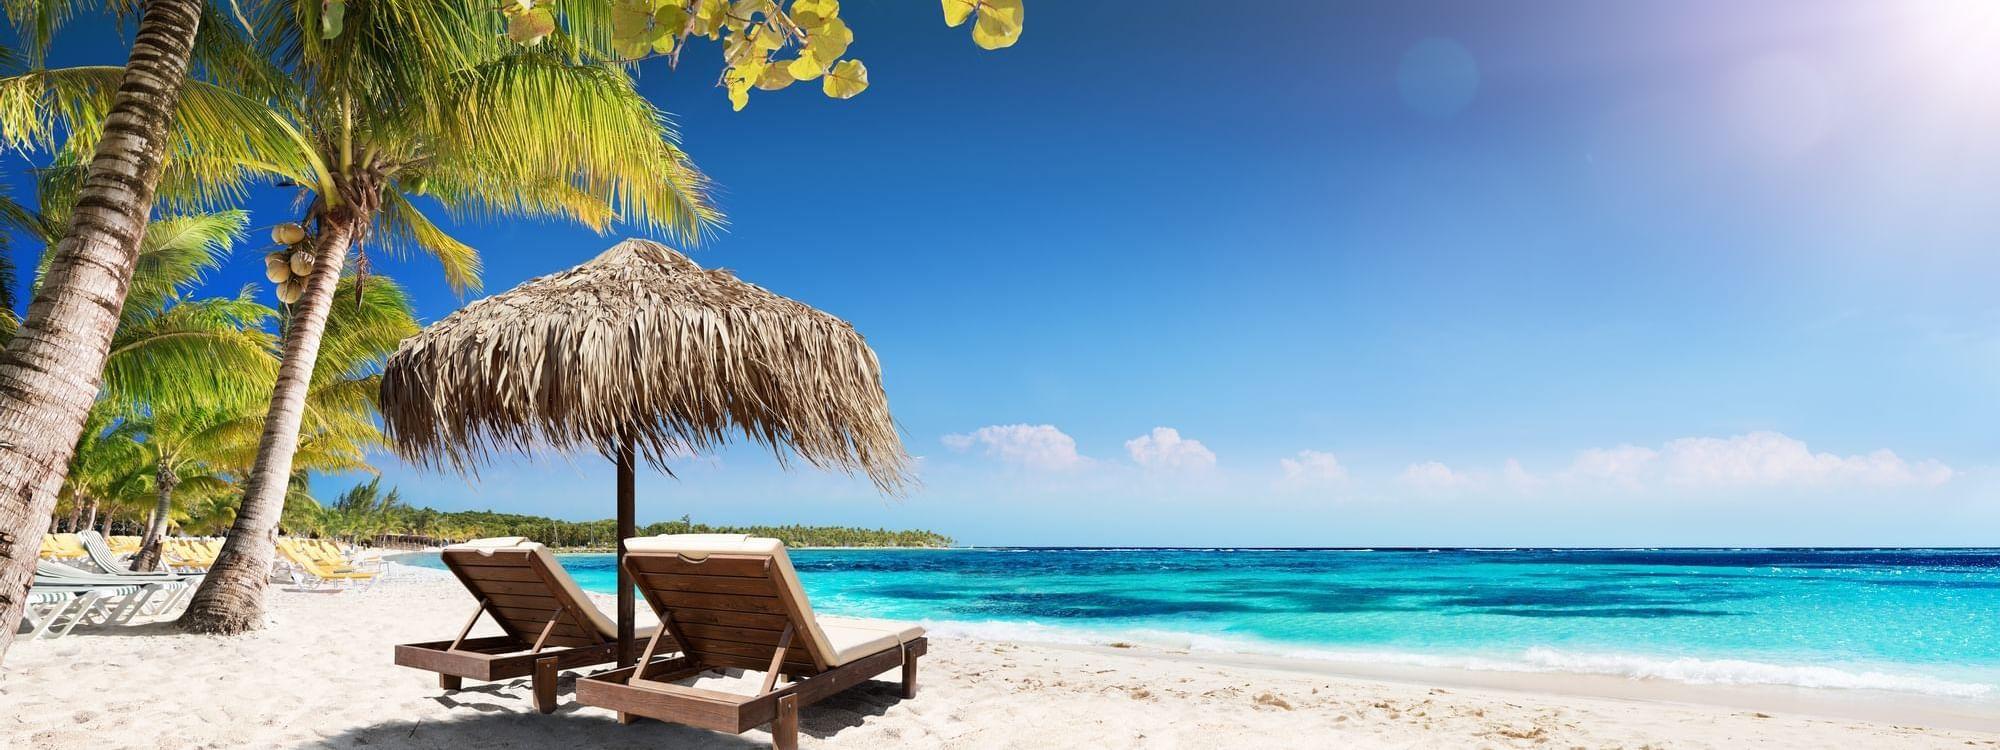 Sun loungers on beach at Daydream Island Resort